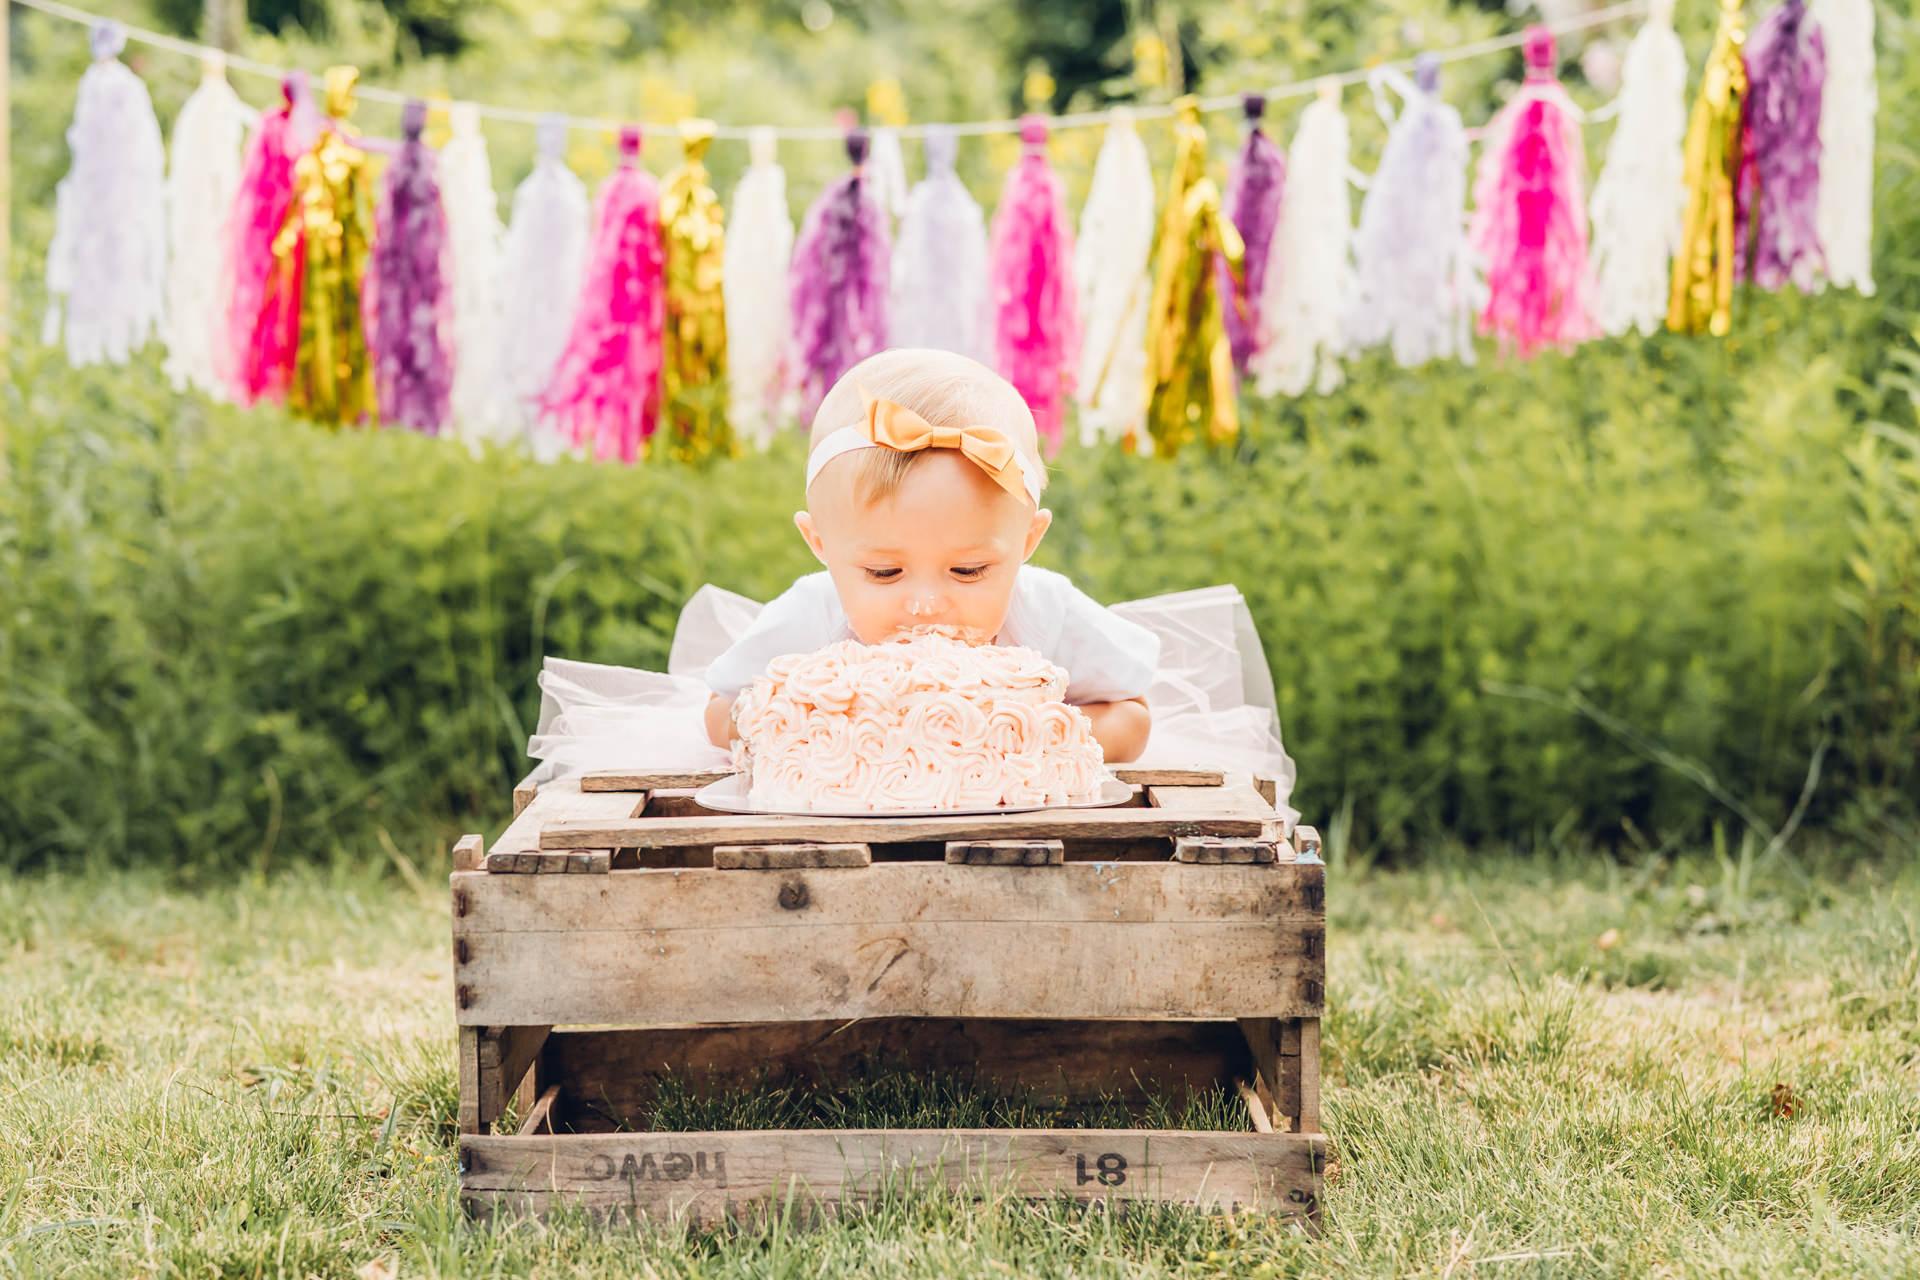 Cake Smash Fotoshooting Fotograf Kaiserslautern